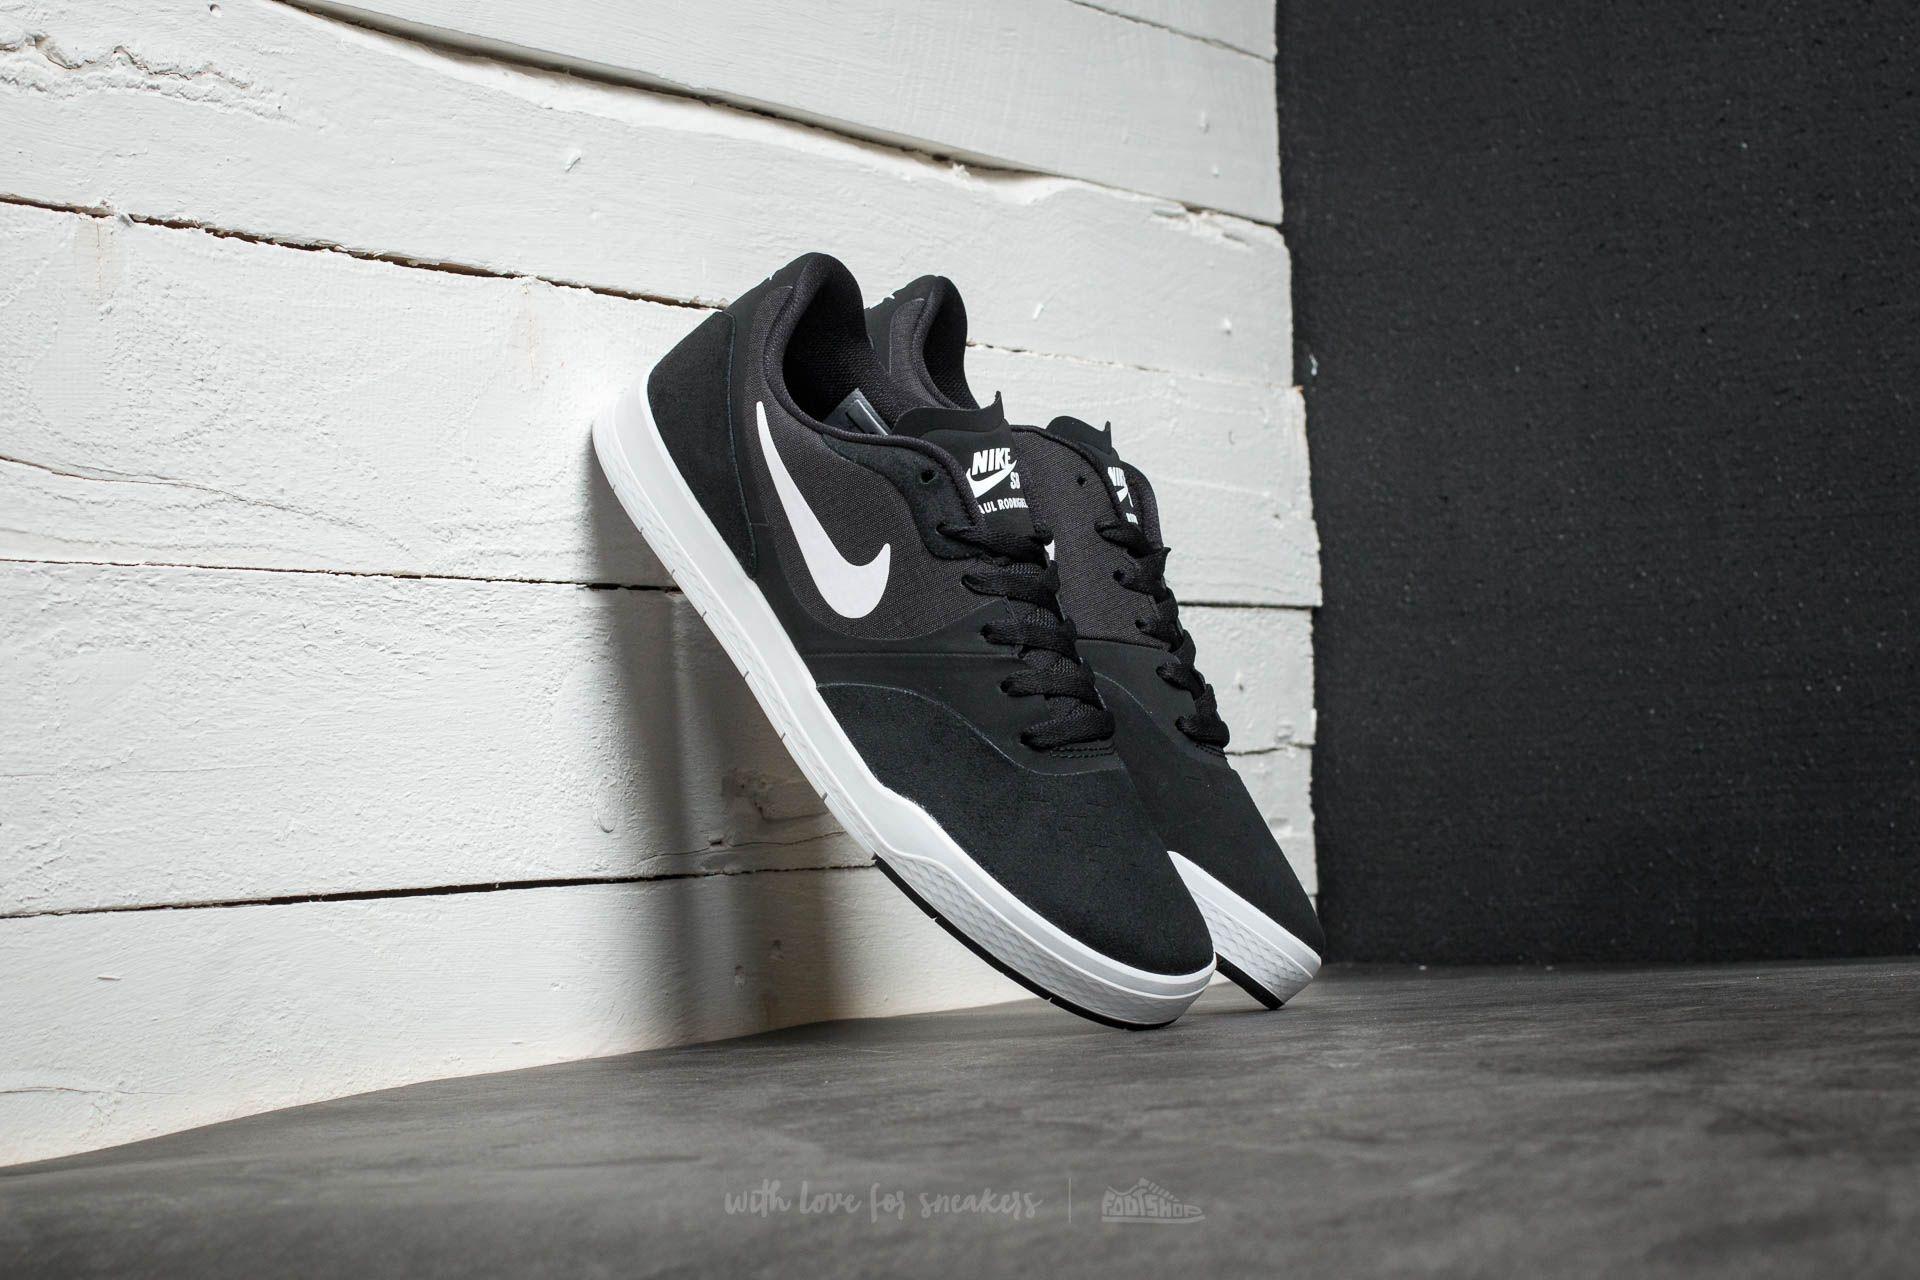 Nike Paul Rodriguez 9 CS Black/ White-Black